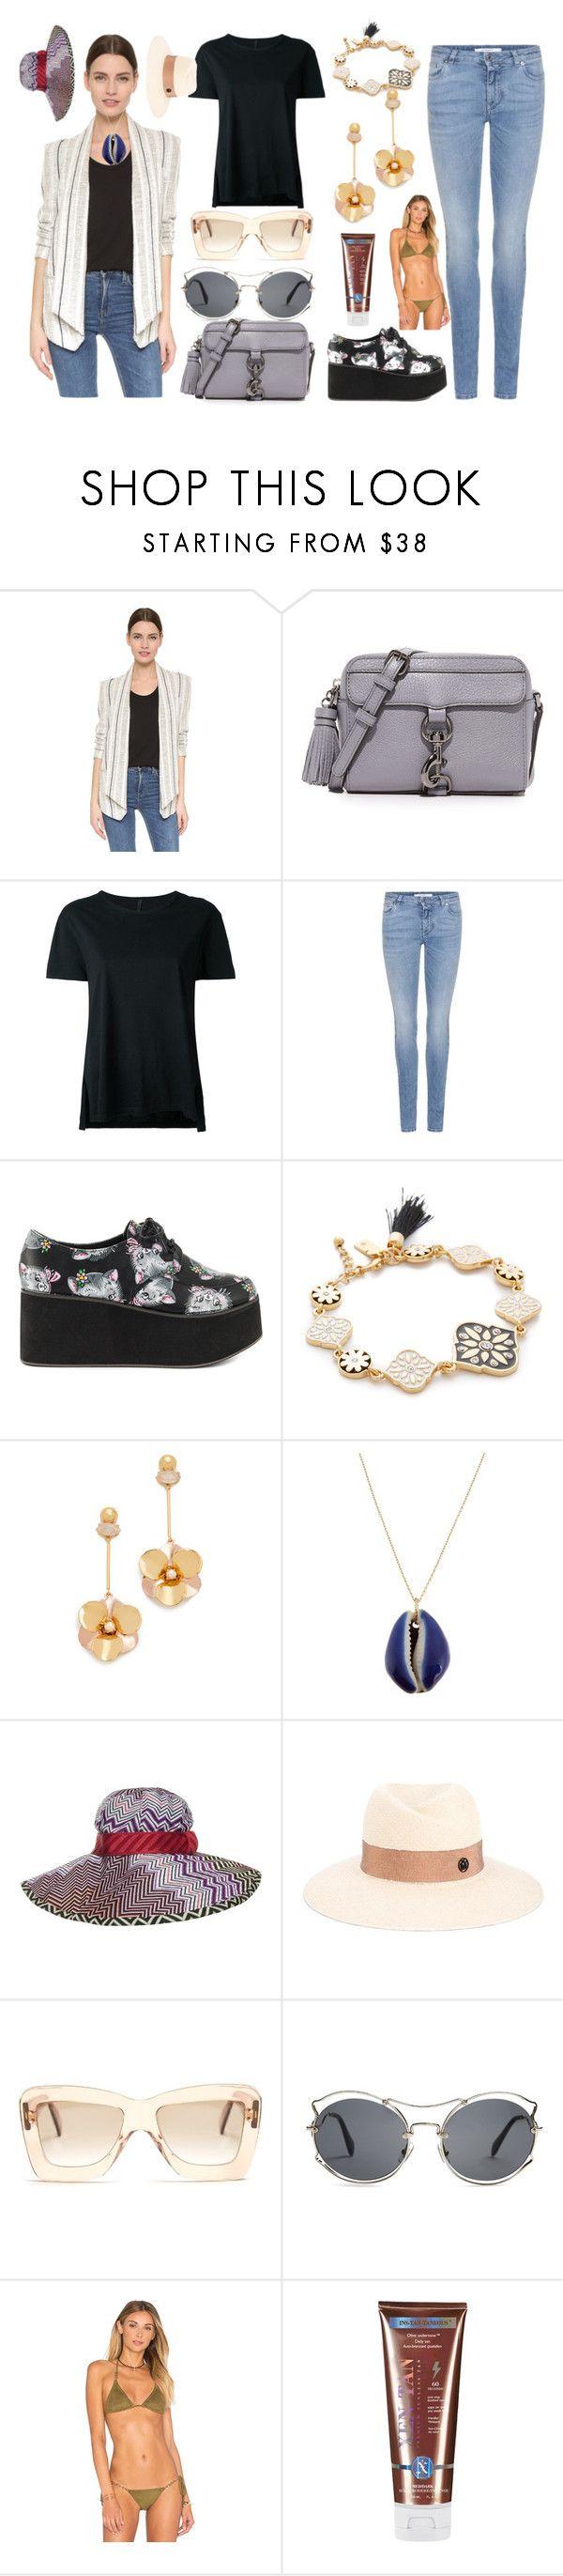 """Fashion things"" by gadinarmada-1 ❤ liked on Polyvore featuring Rebecca Minkoff, Nobody Denim, Givenchy, Iron Fist, Kate Spade, Aurélie Bidermann, Missoni, Maison Michel, Roksanda and Miu Miu"